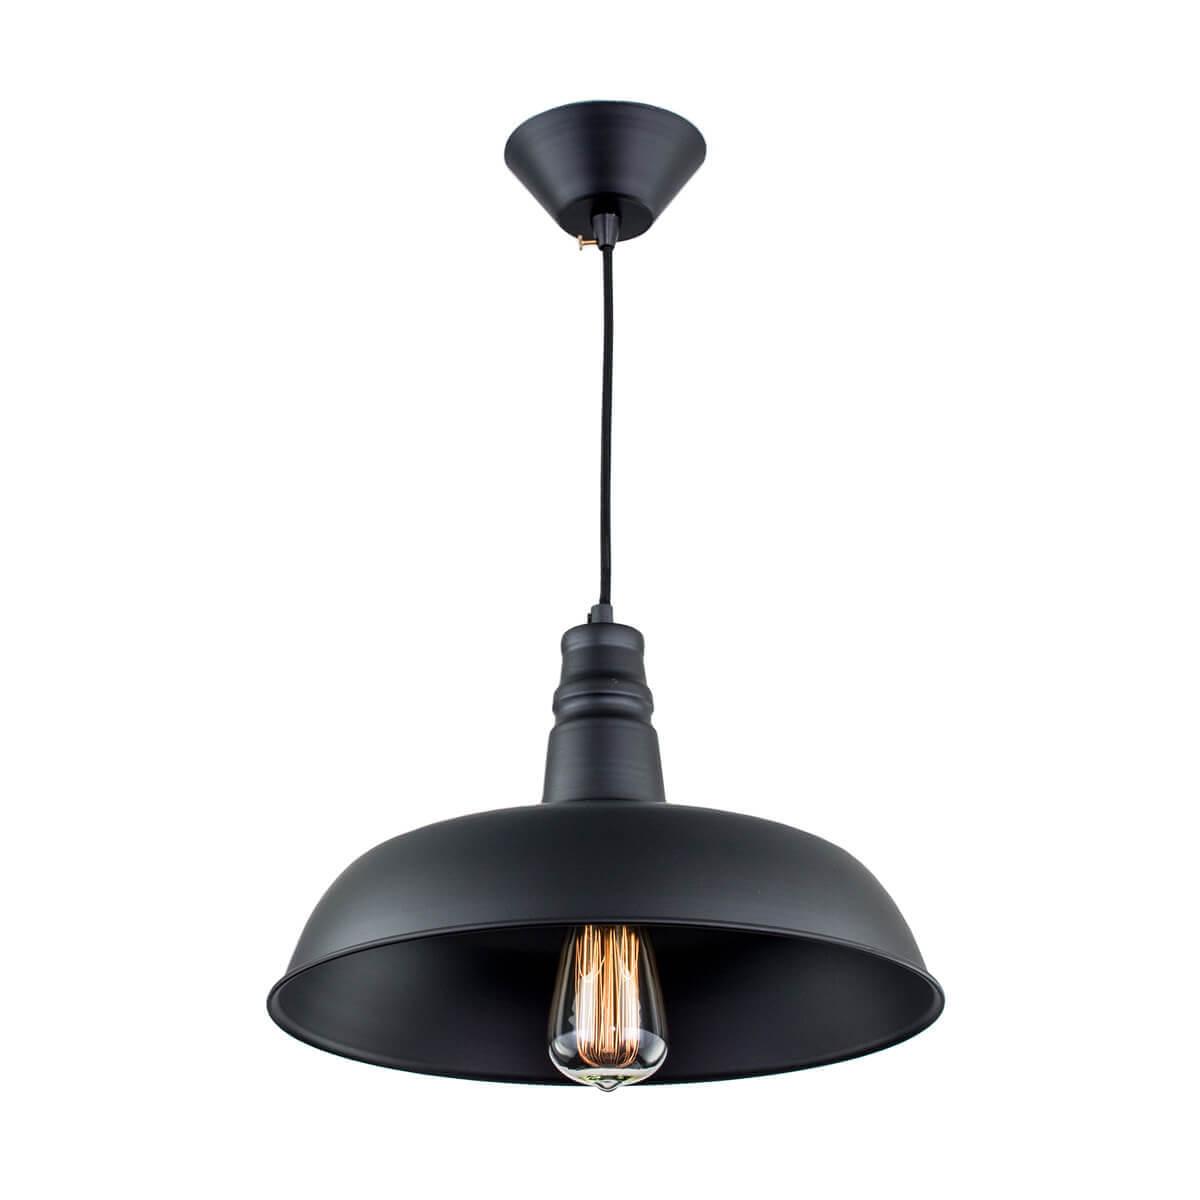 цена на Светильник Citilux CL450204 Эдисон